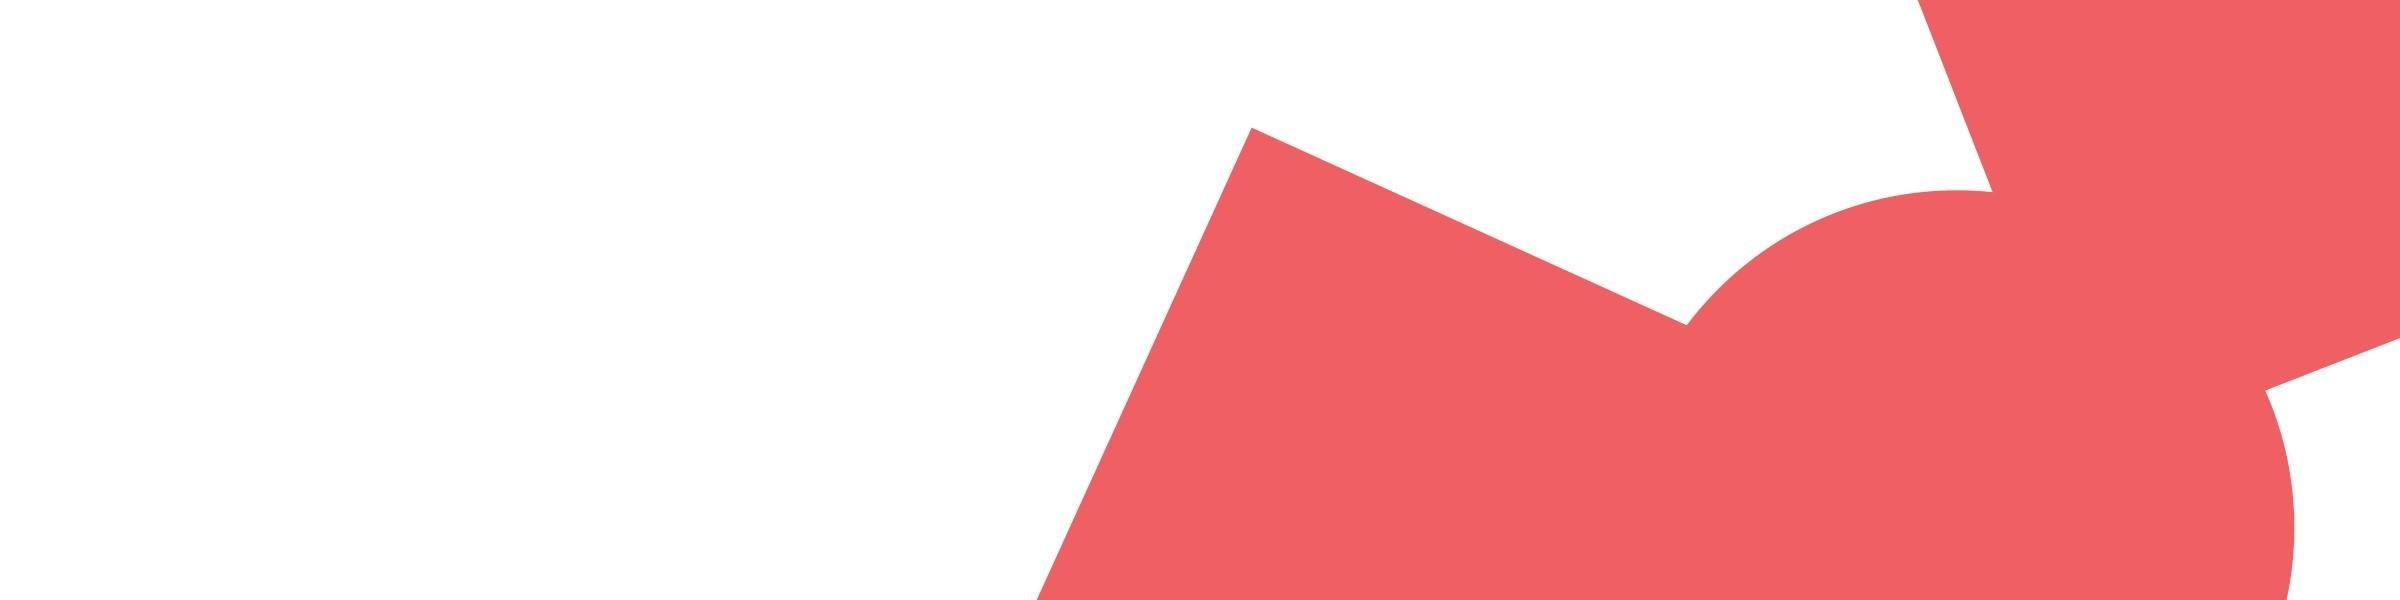 Banner - rød